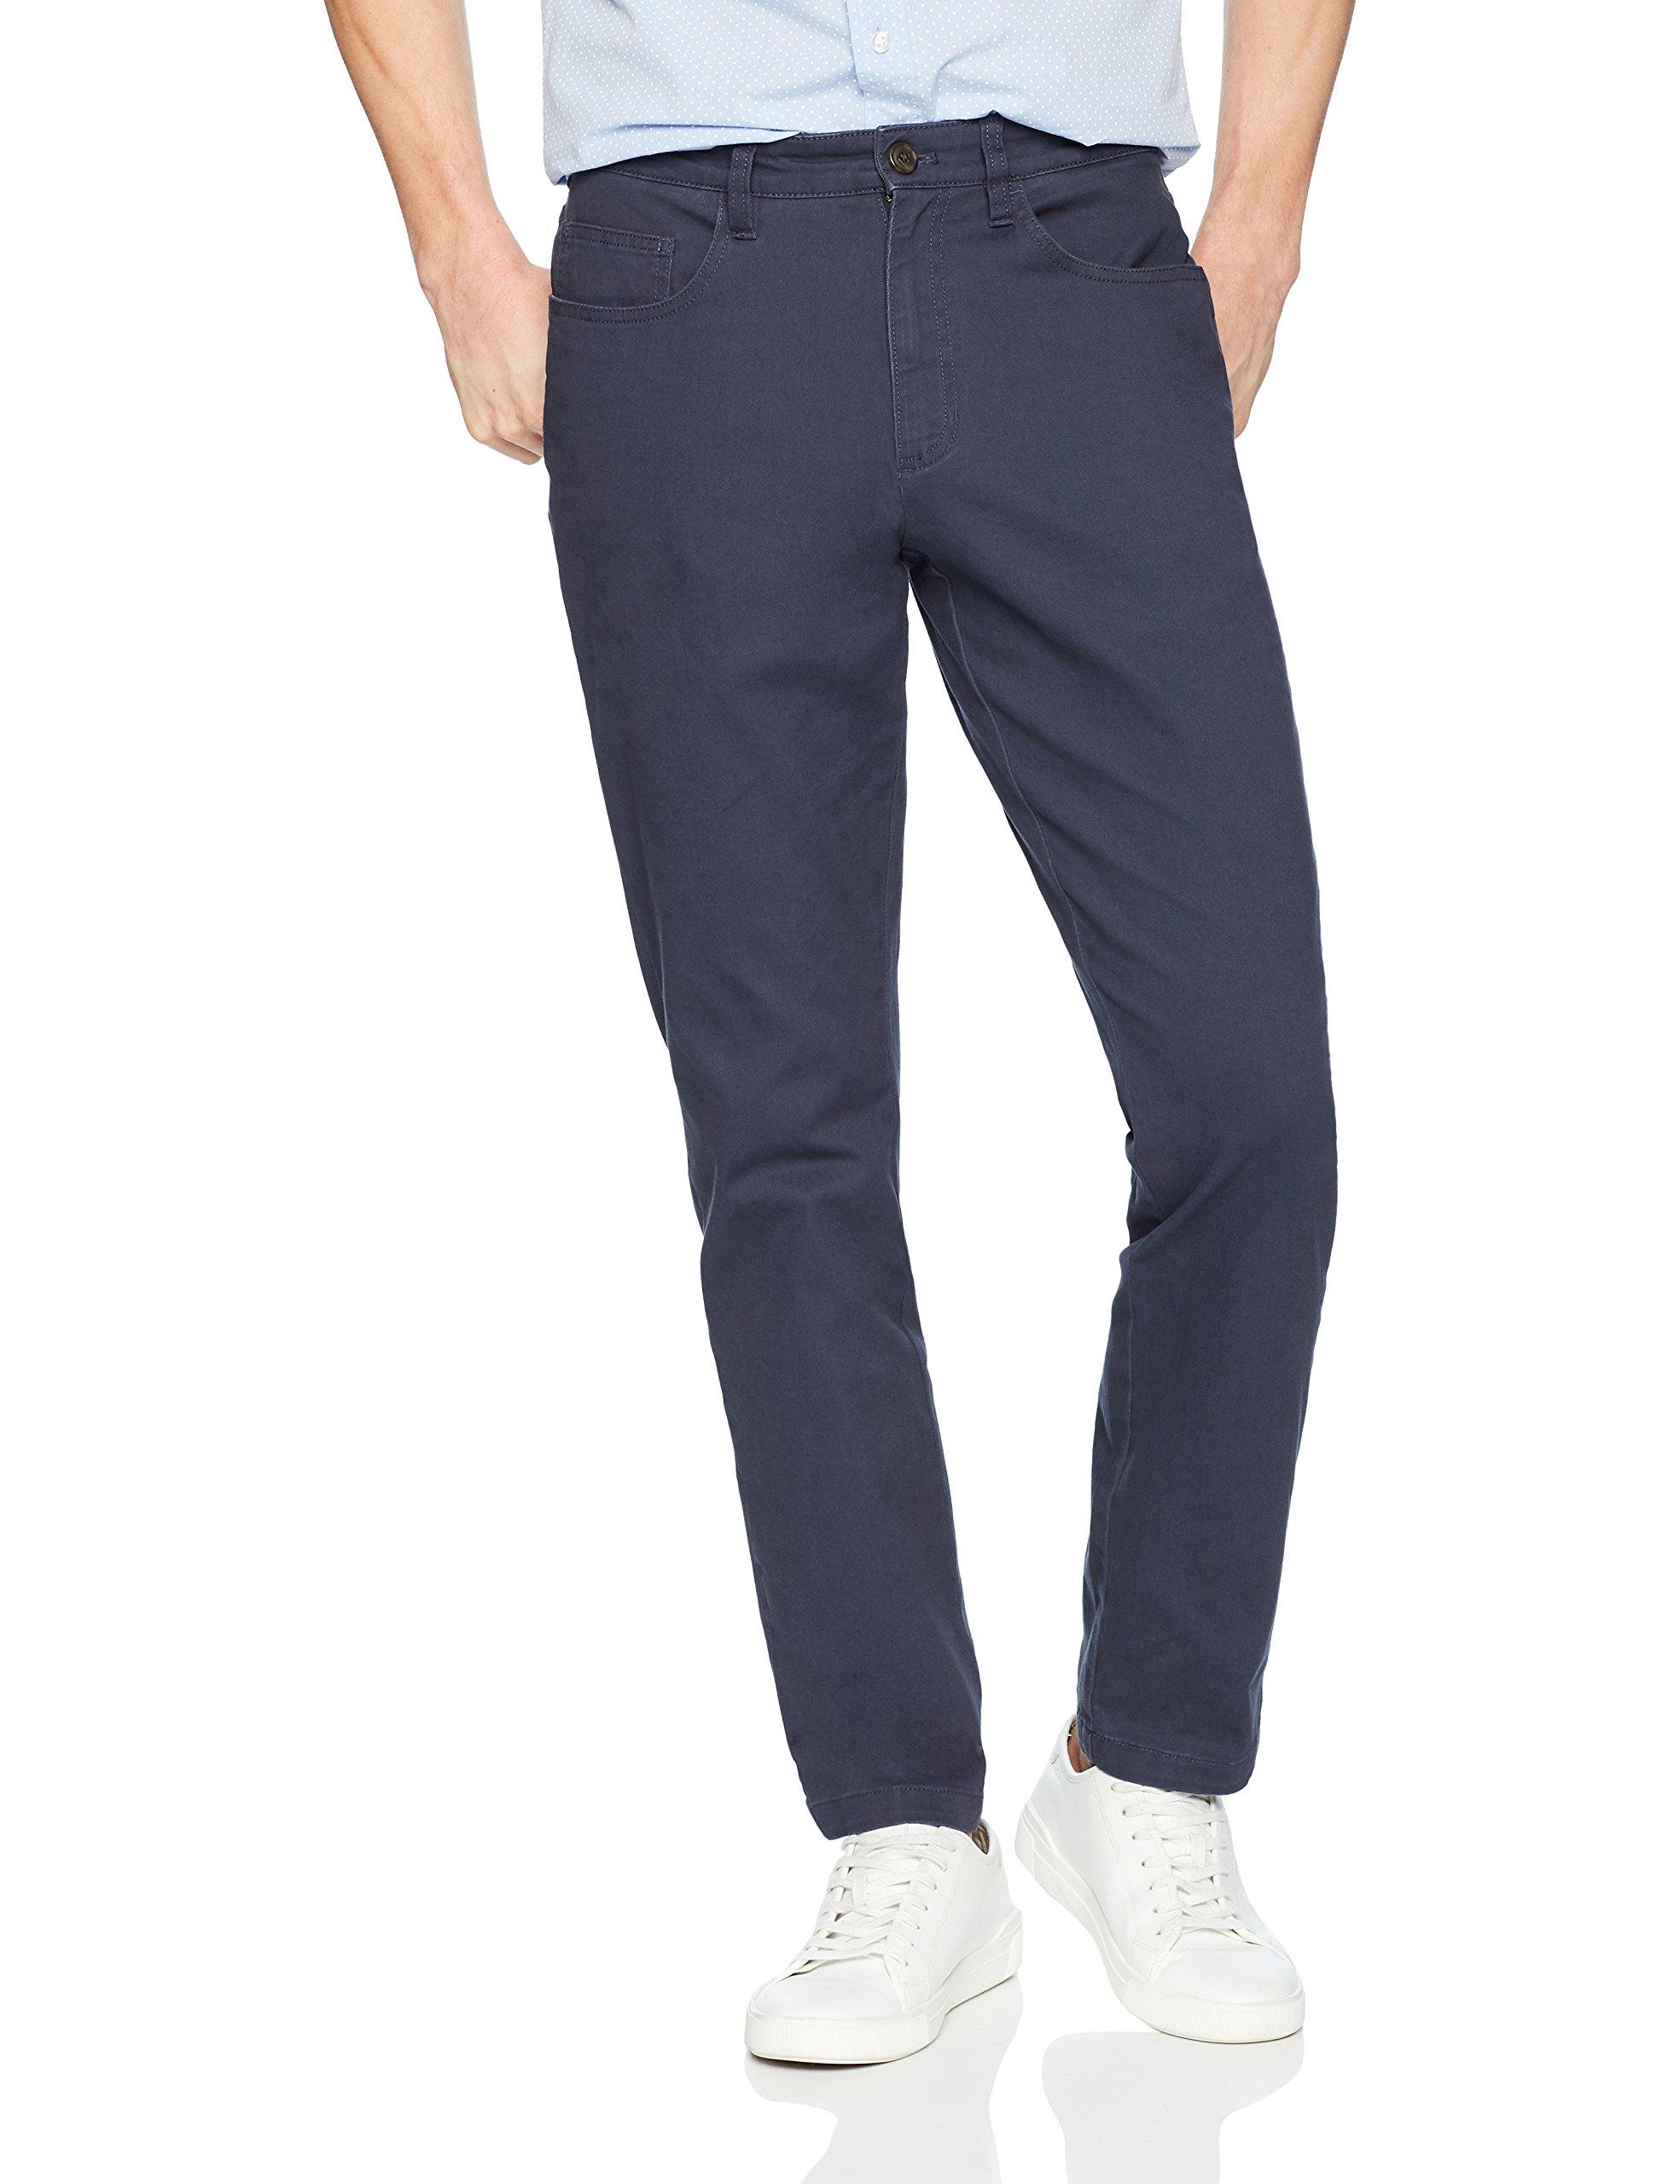 Goodthreads Men's Slim-Fit 5-Pocket Chino Pant, Navy, 38W x 29L